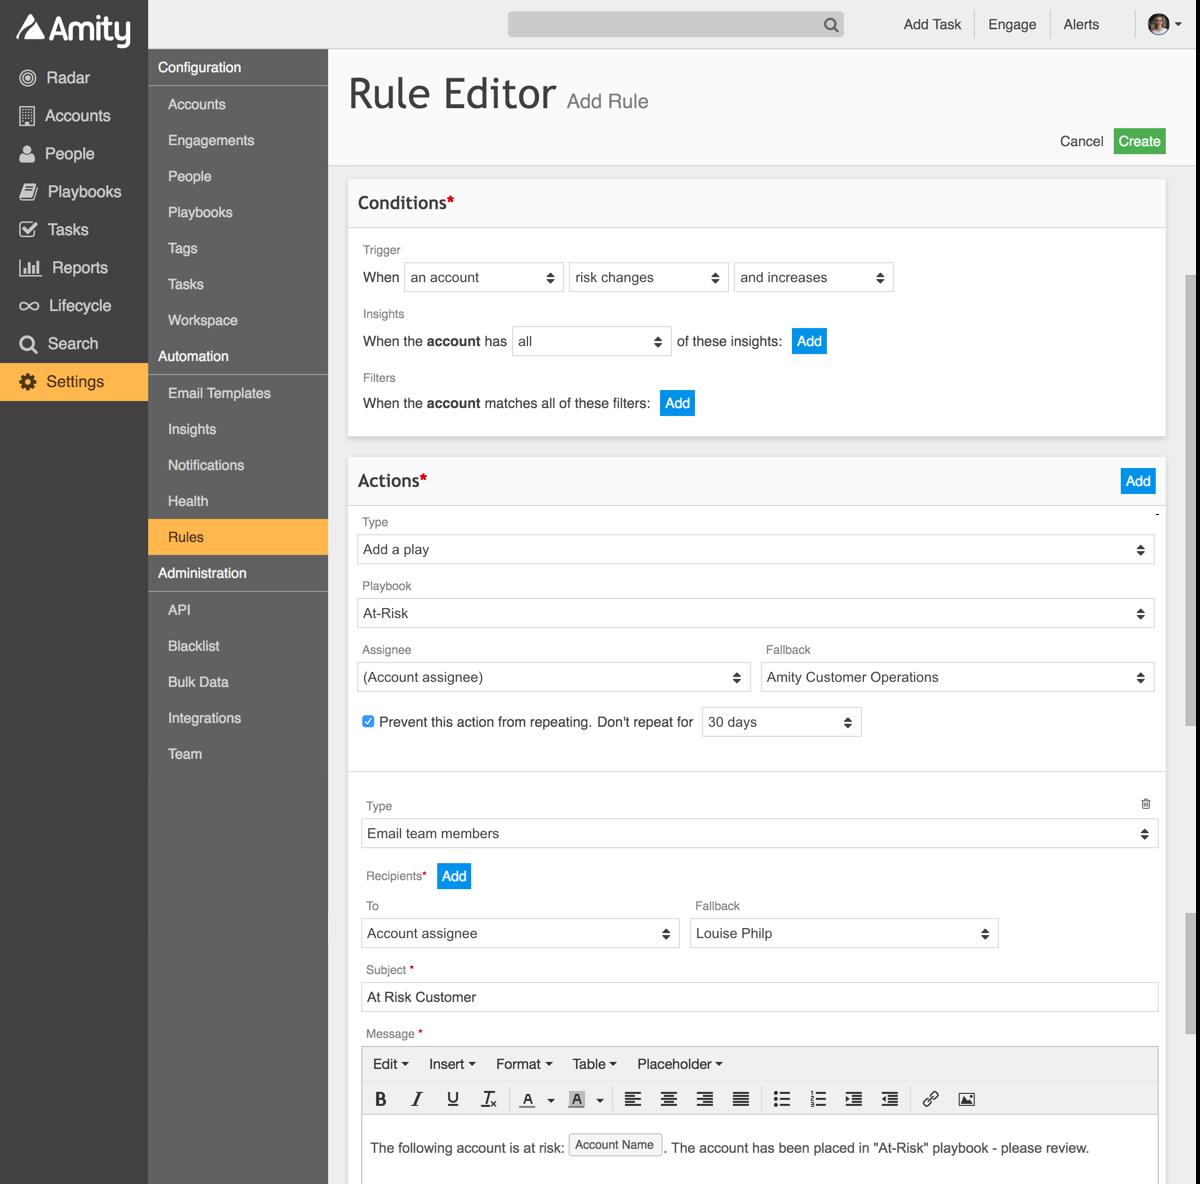 Amity Rule Editor